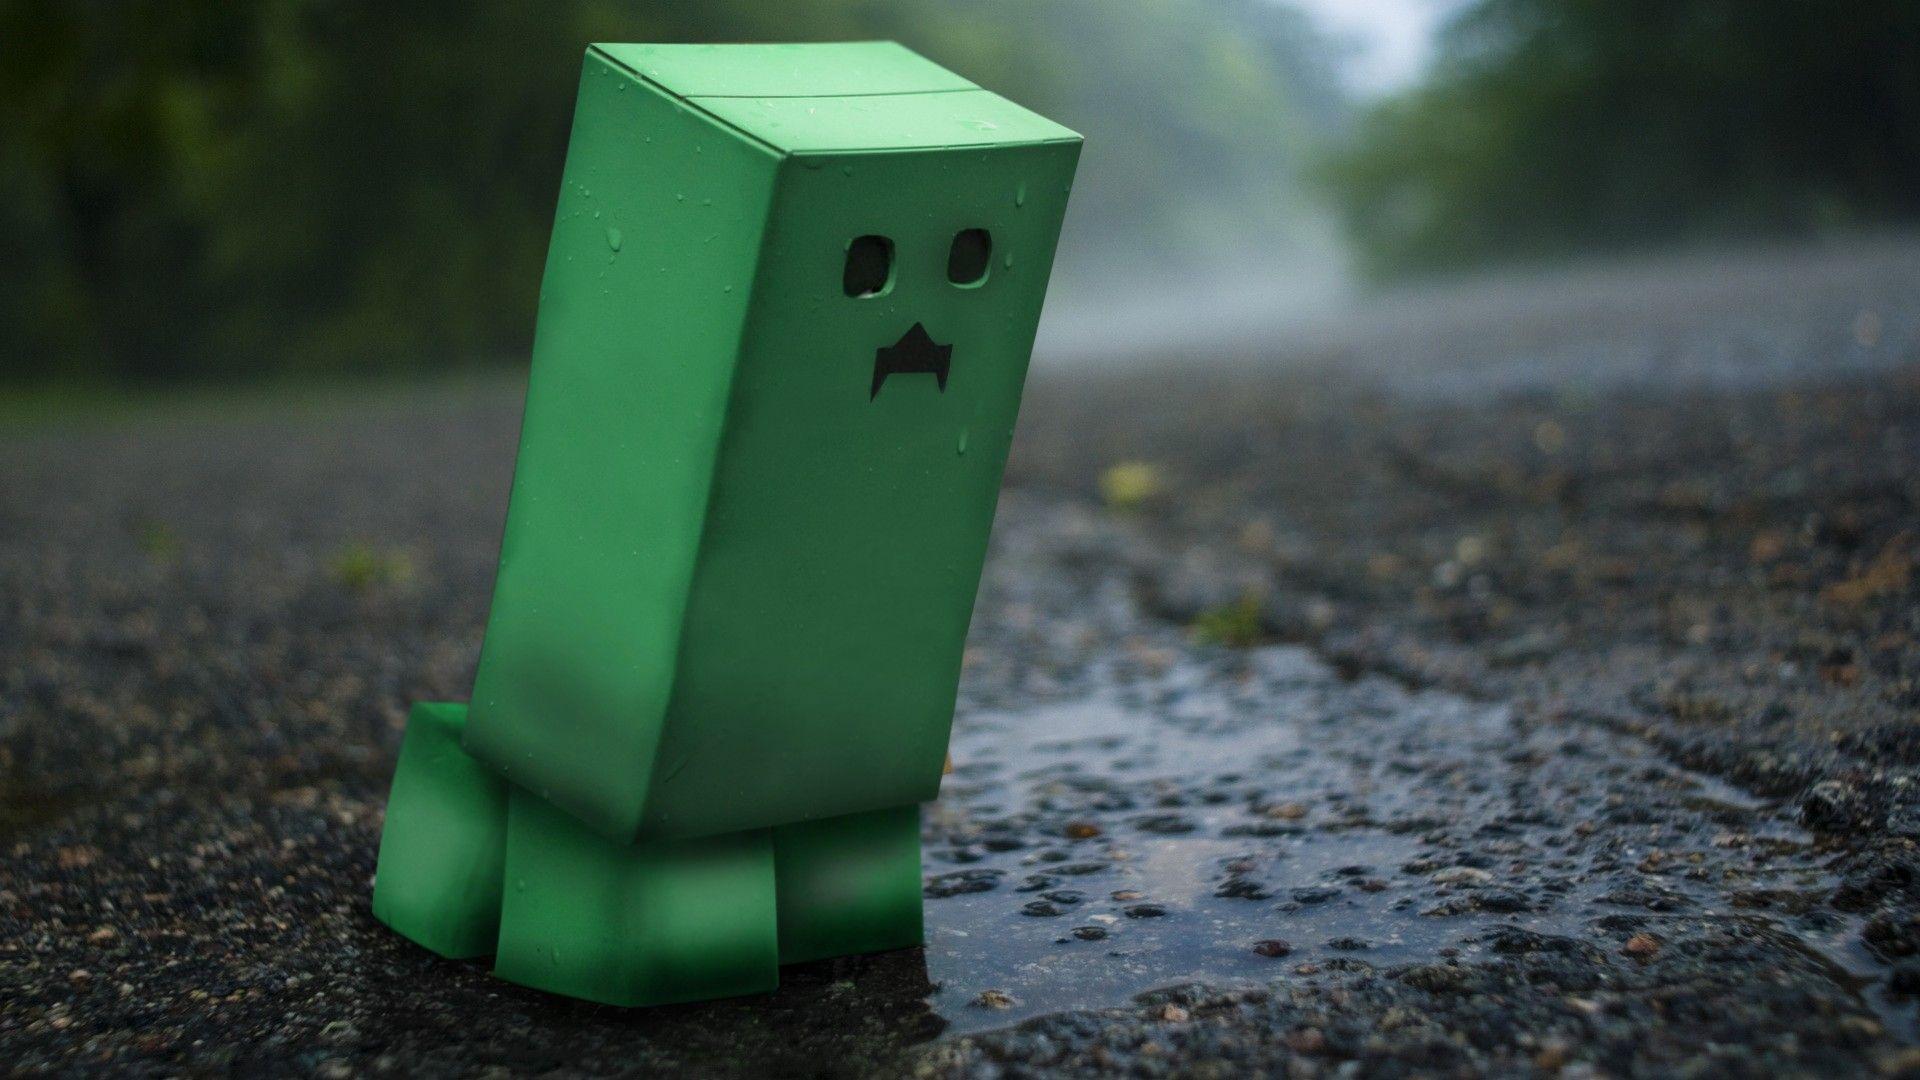 Creeper Minecraft Images